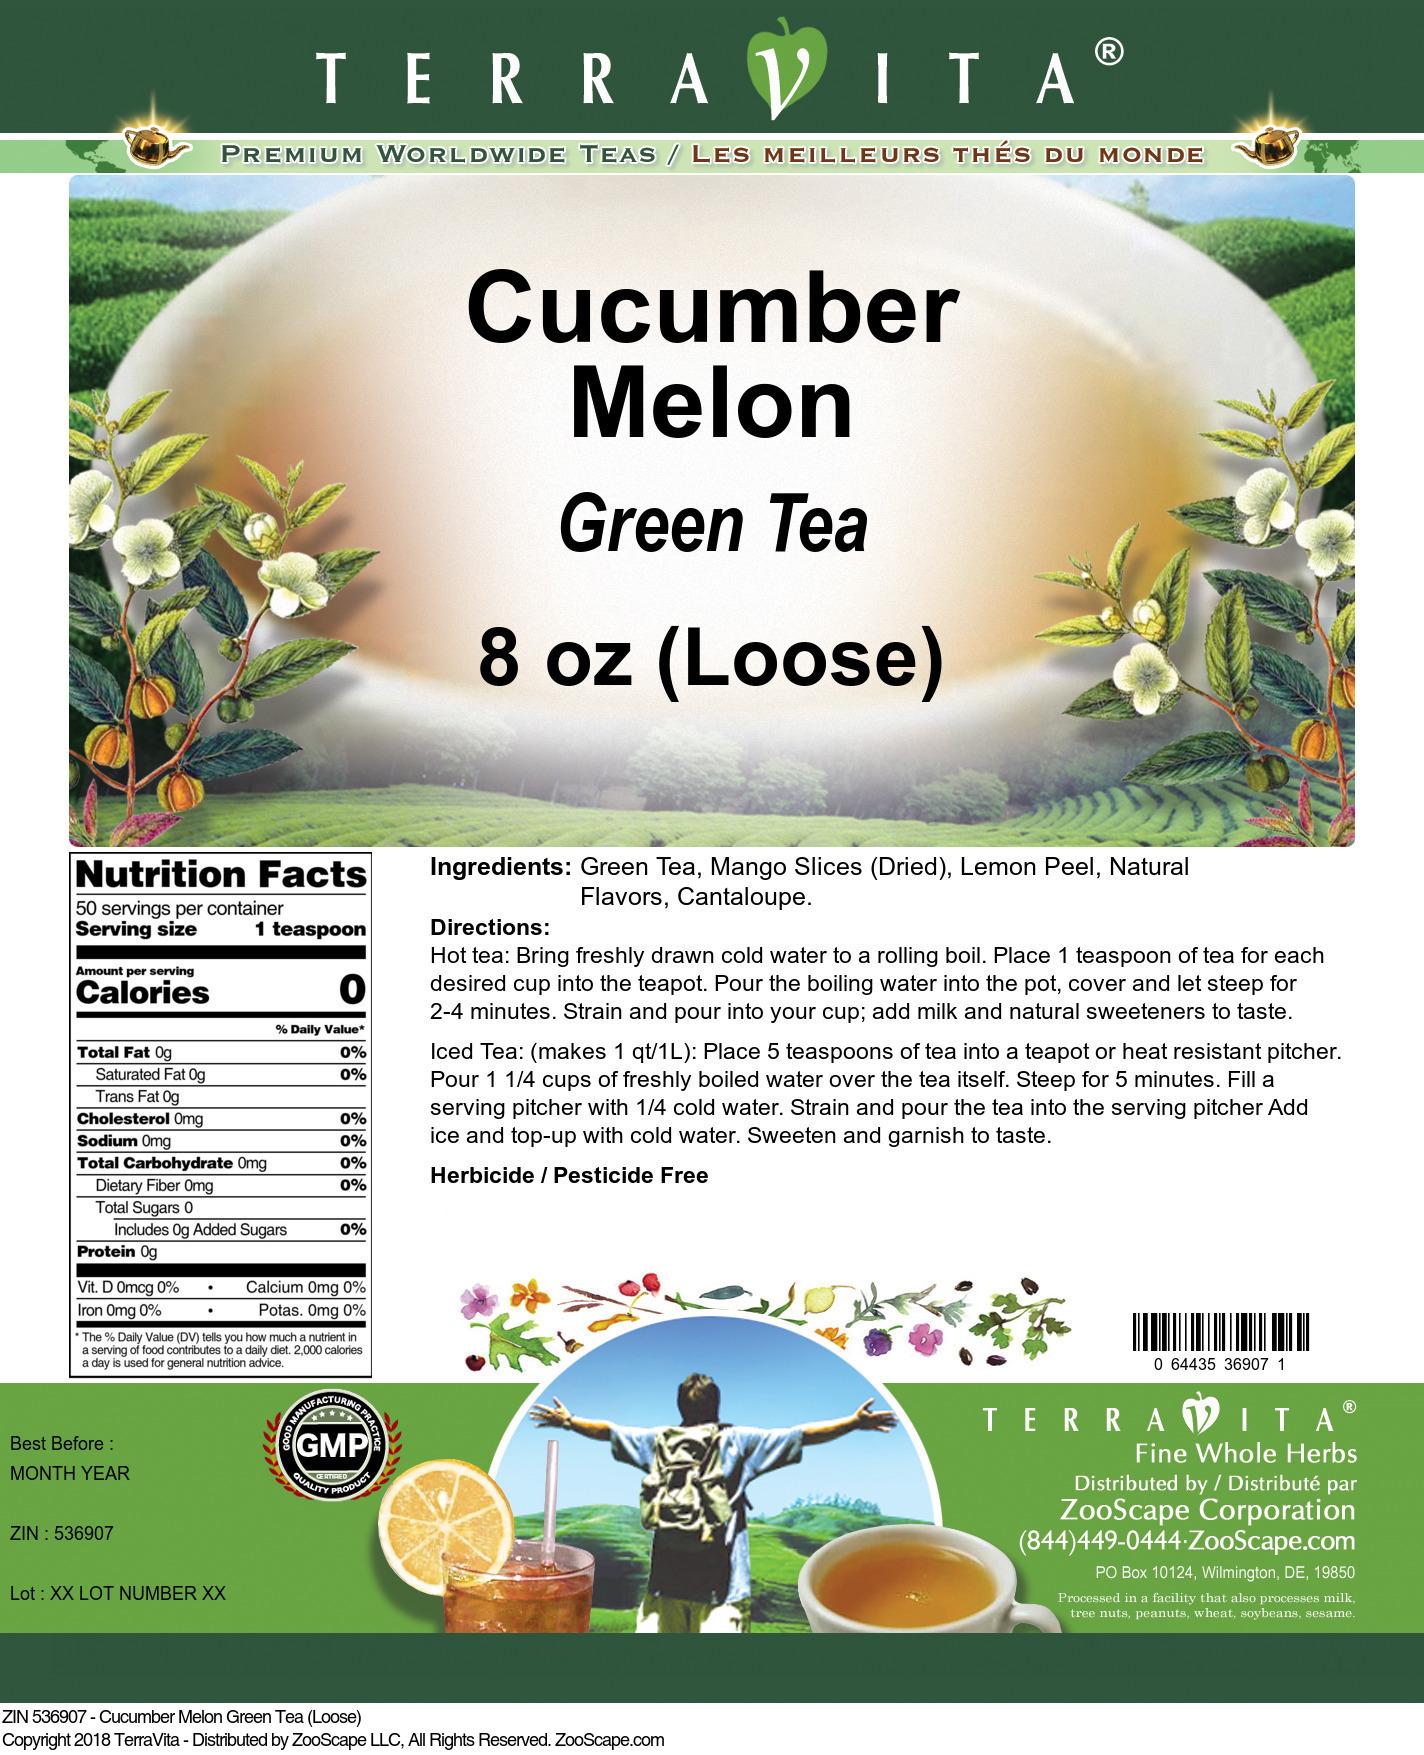 Cucumber Melon Green Tea